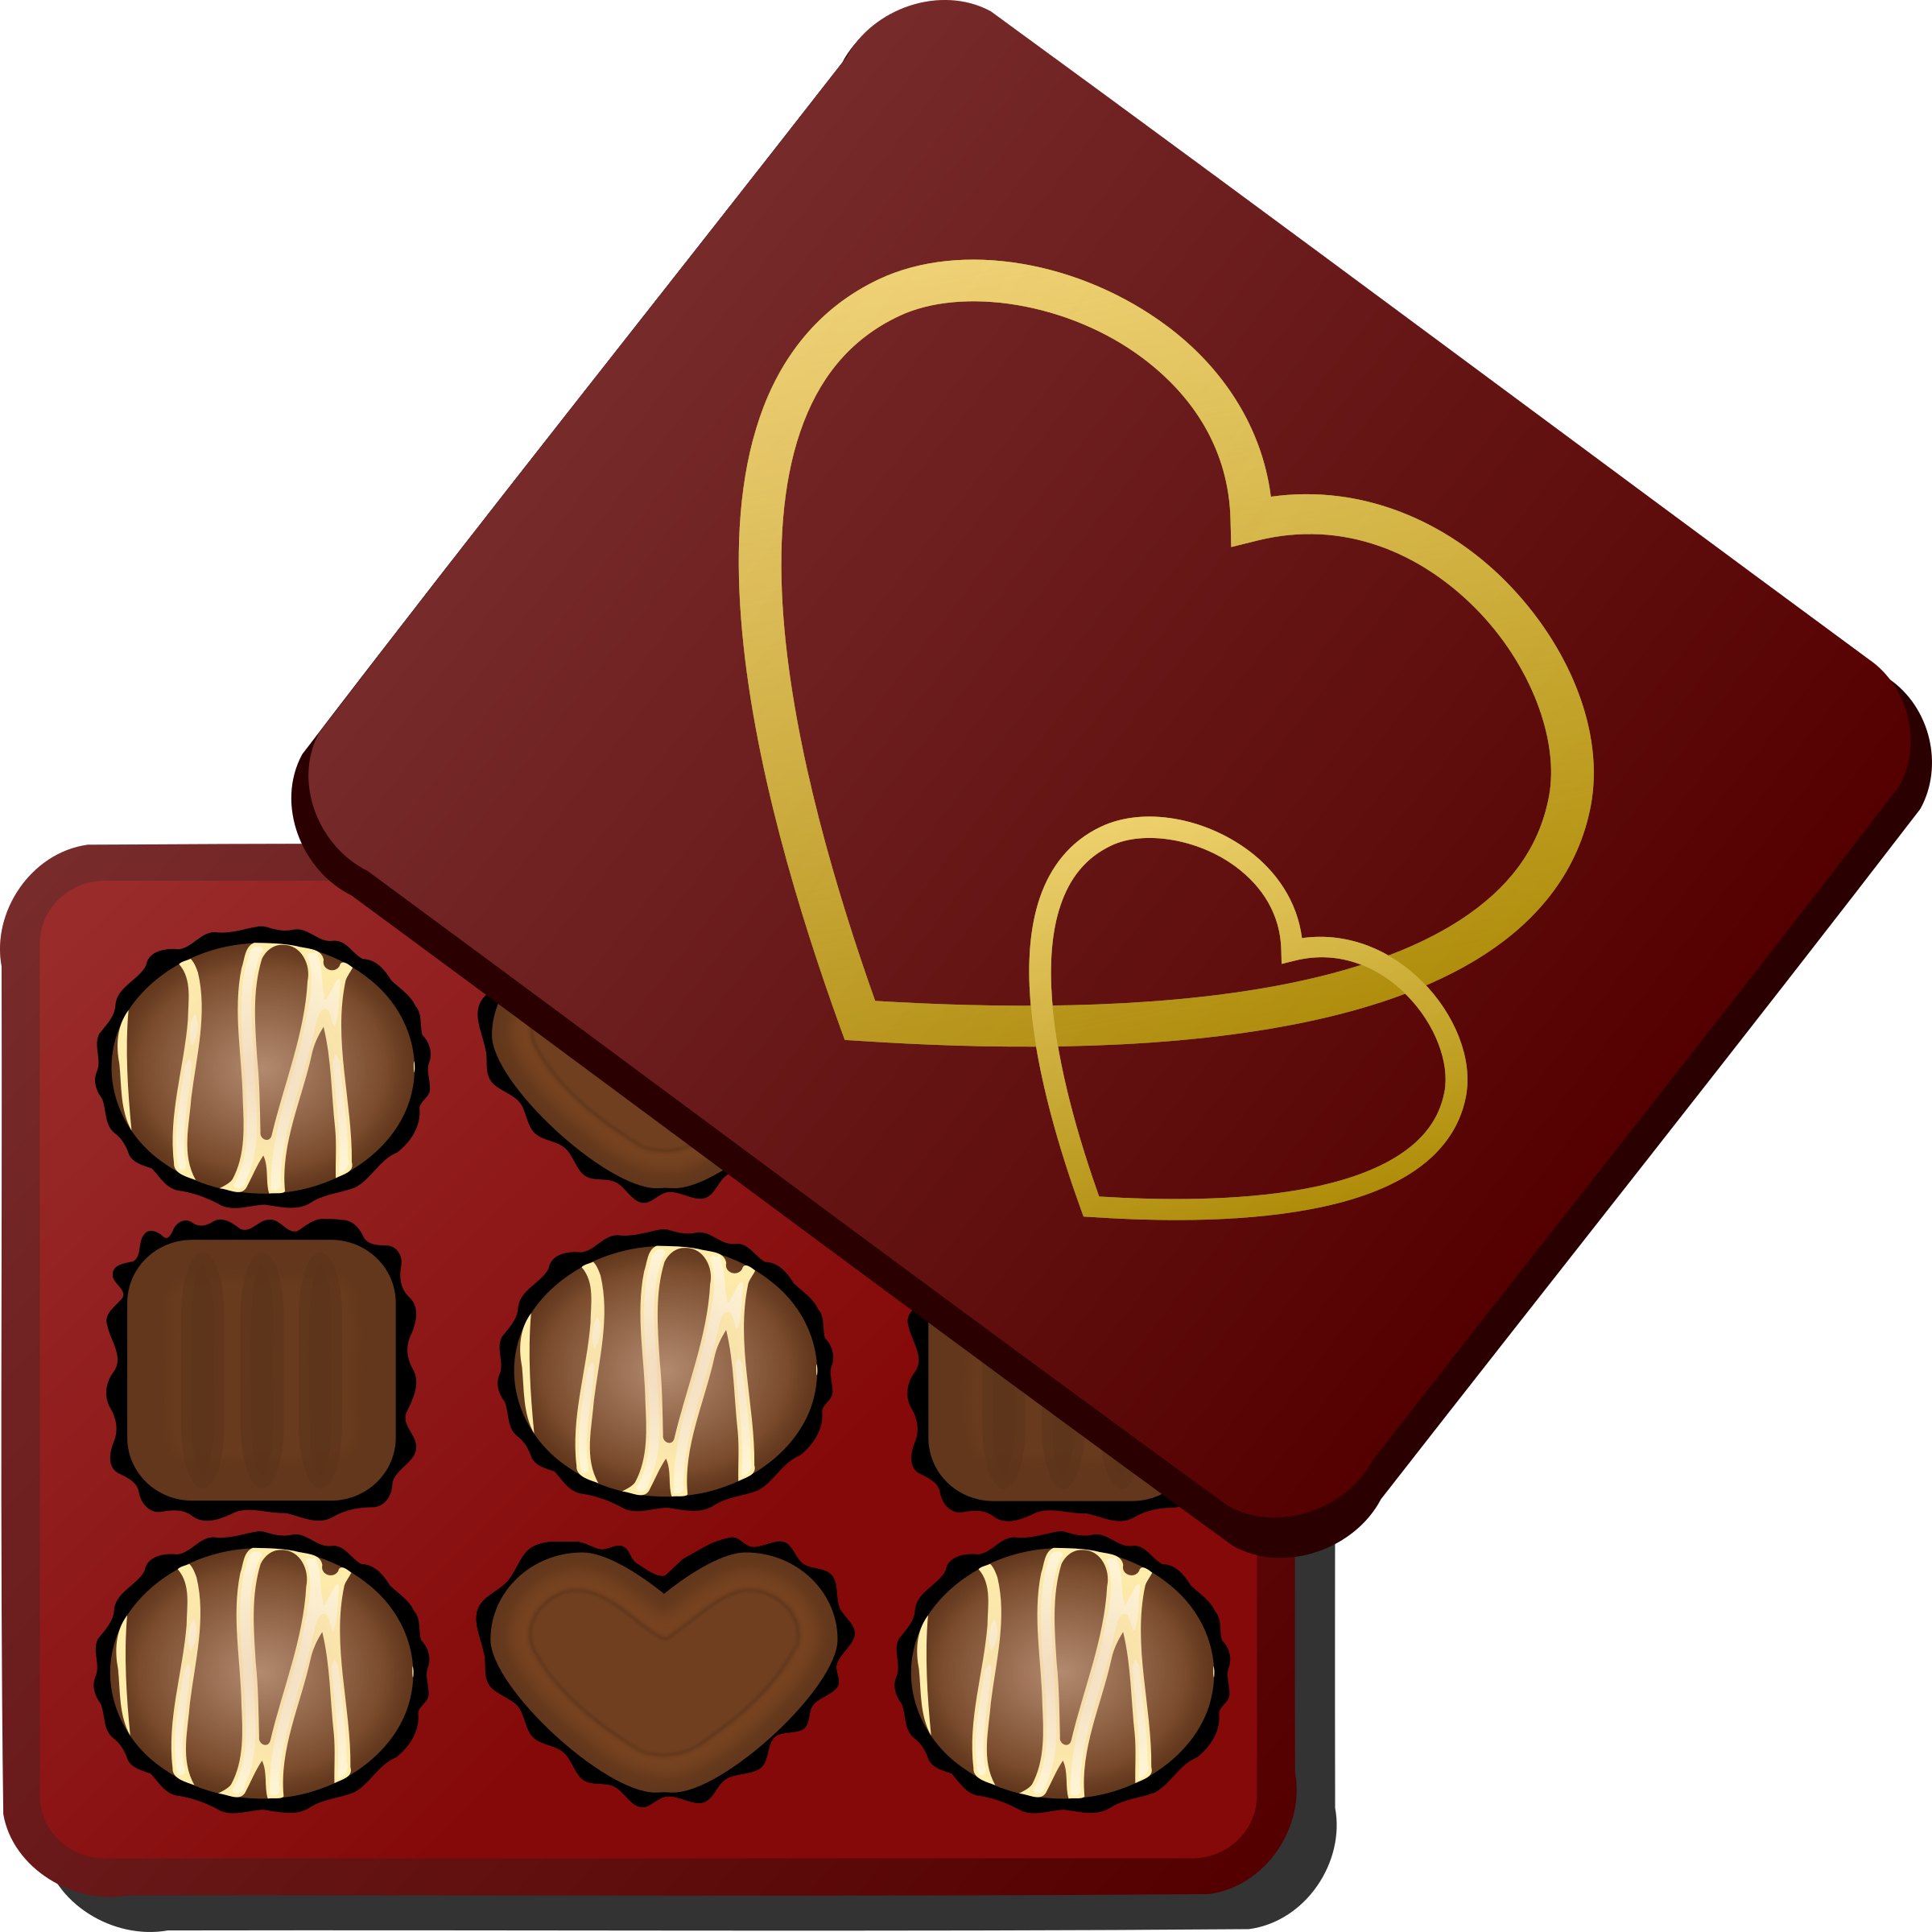 Box of chocolates big. Valentine clipart chocolate